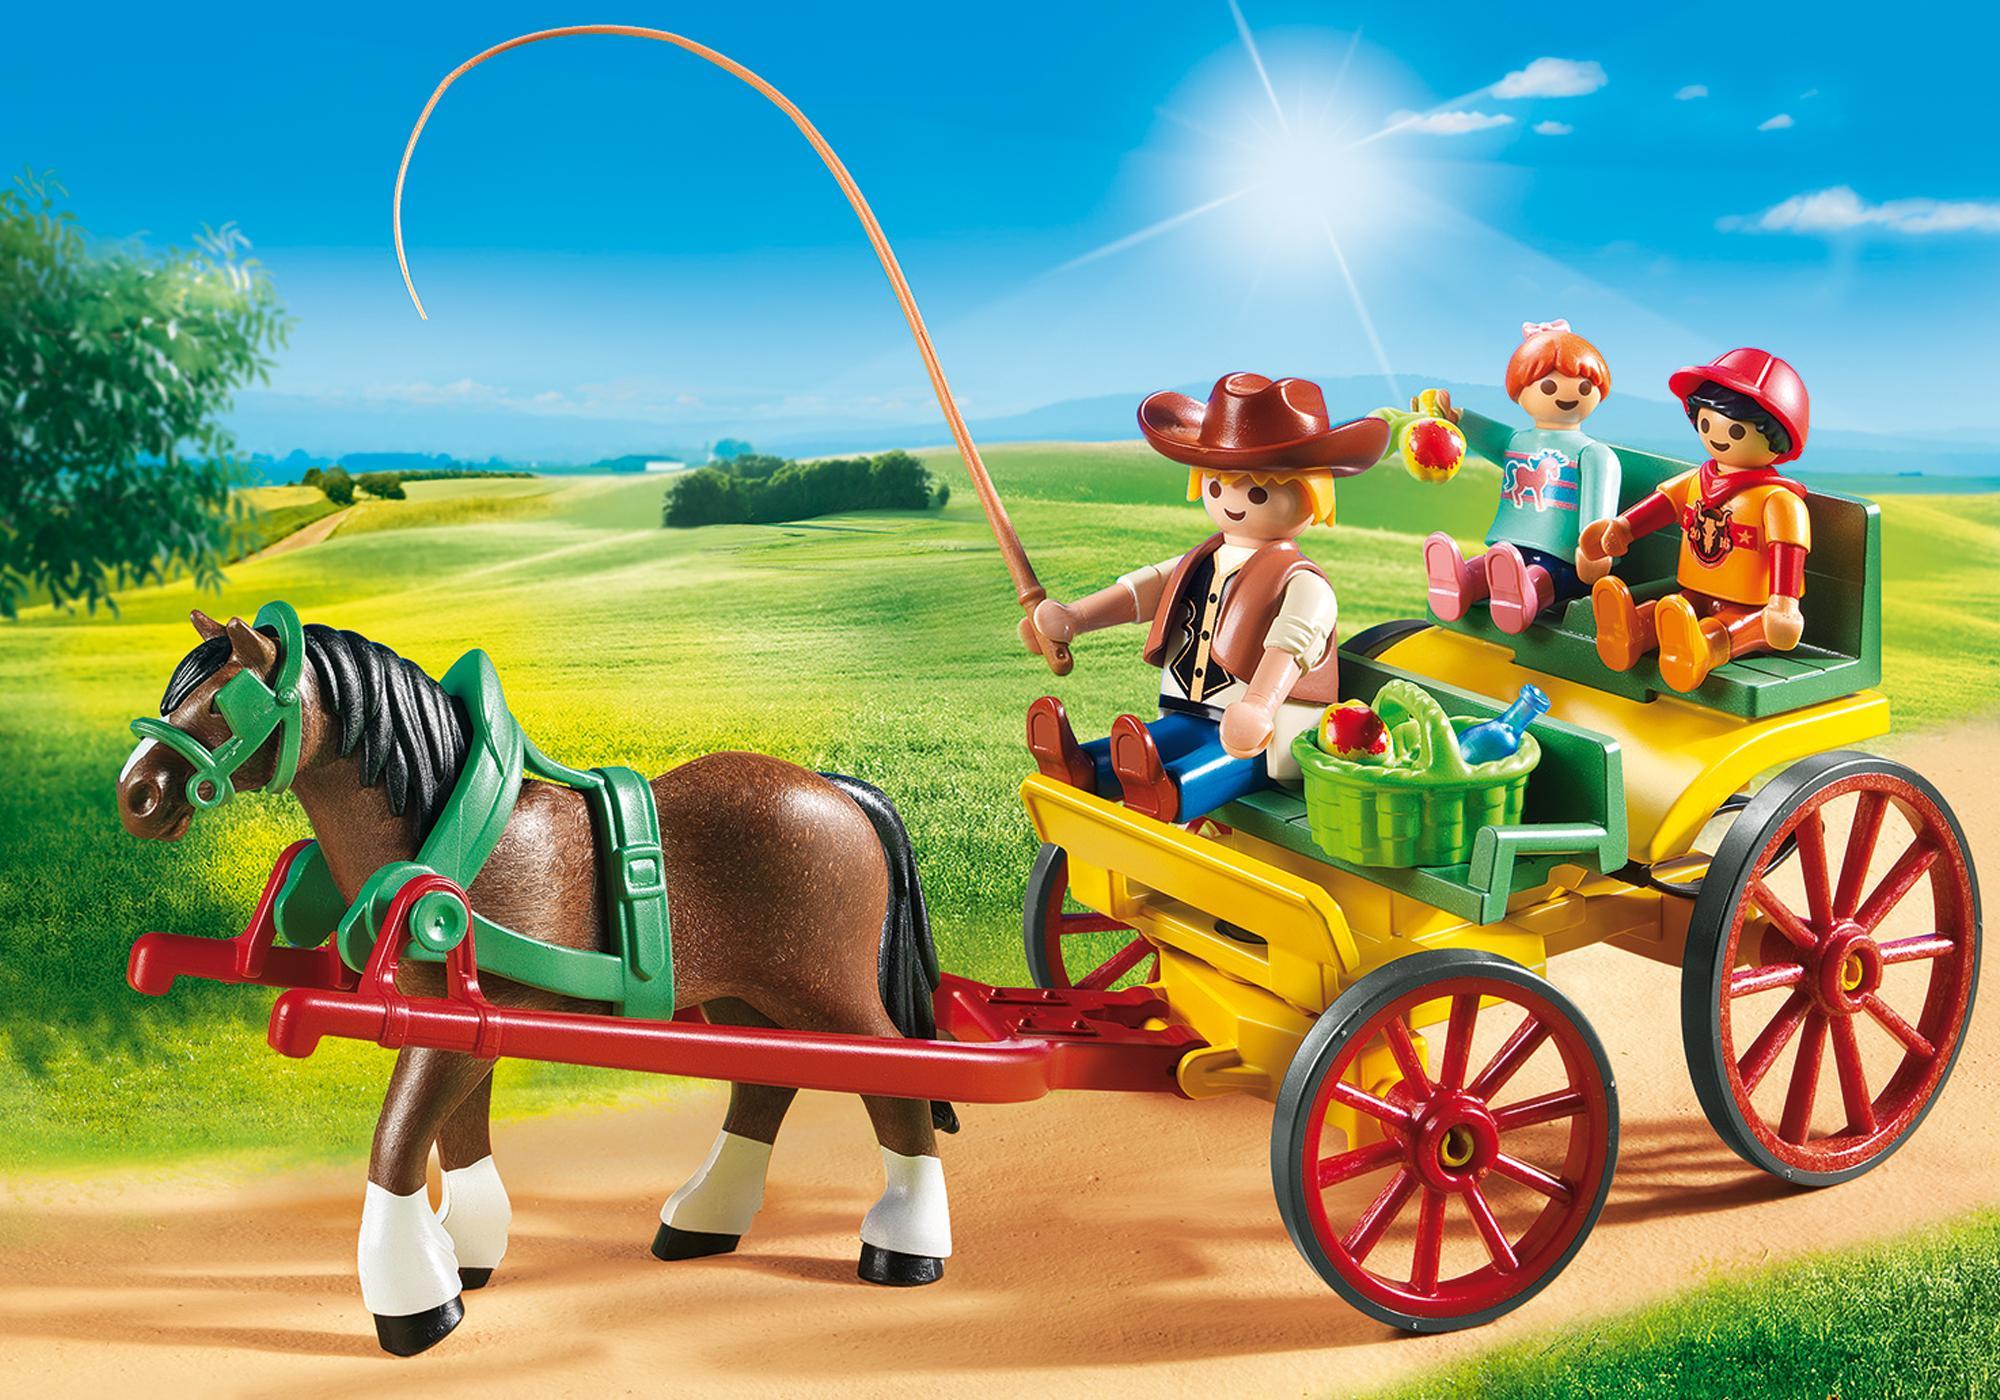 http://media.playmobil.com/i/playmobil/6932_product_detail/Horse-Drawn Wagon